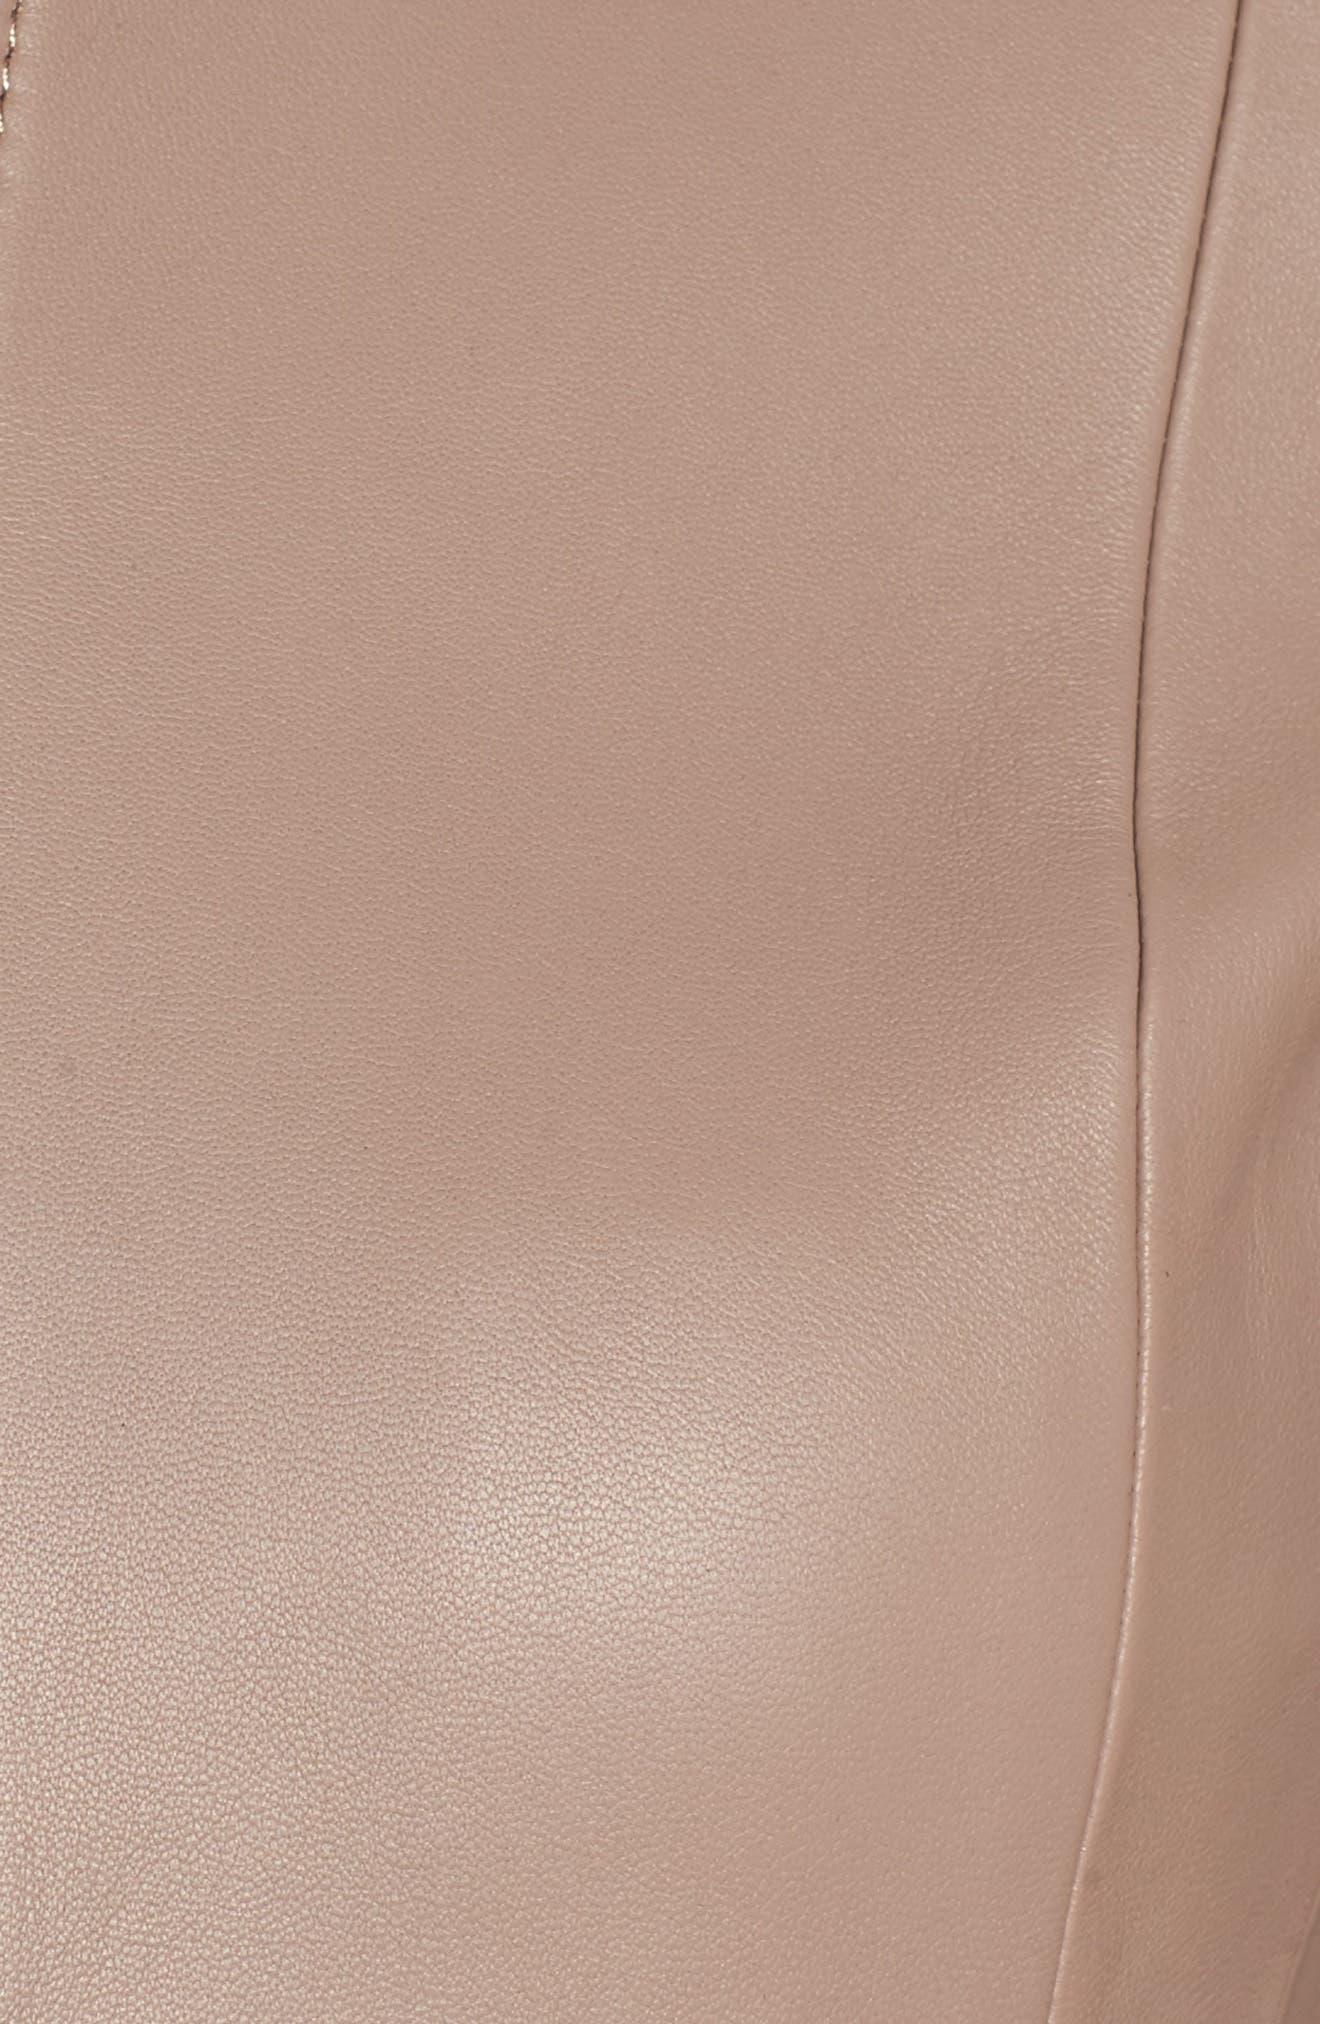 Sammonaie Leather Jacket,                             Alternate thumbnail 9, color,